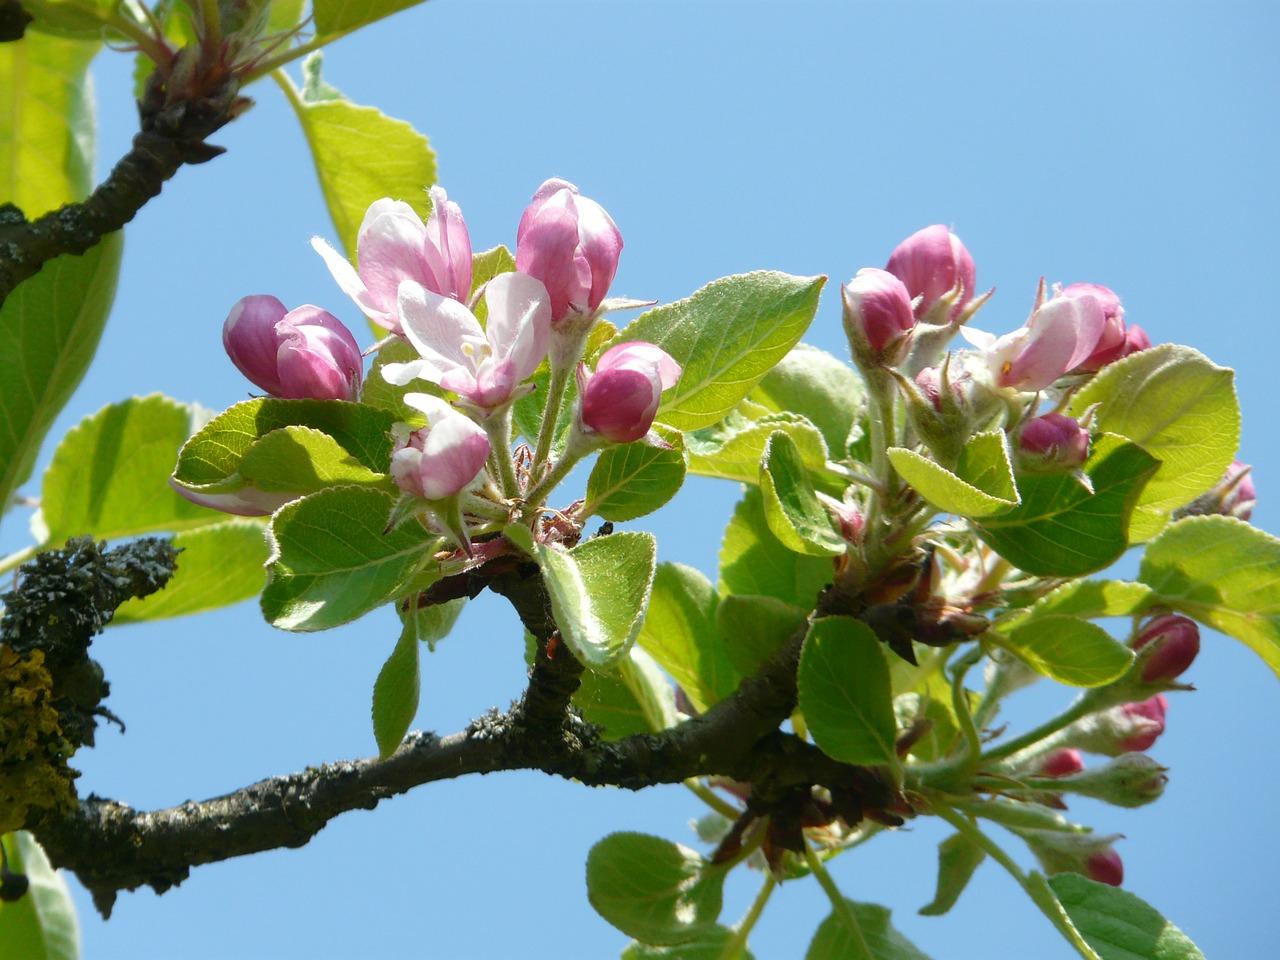 apple-blossom-6966_1280